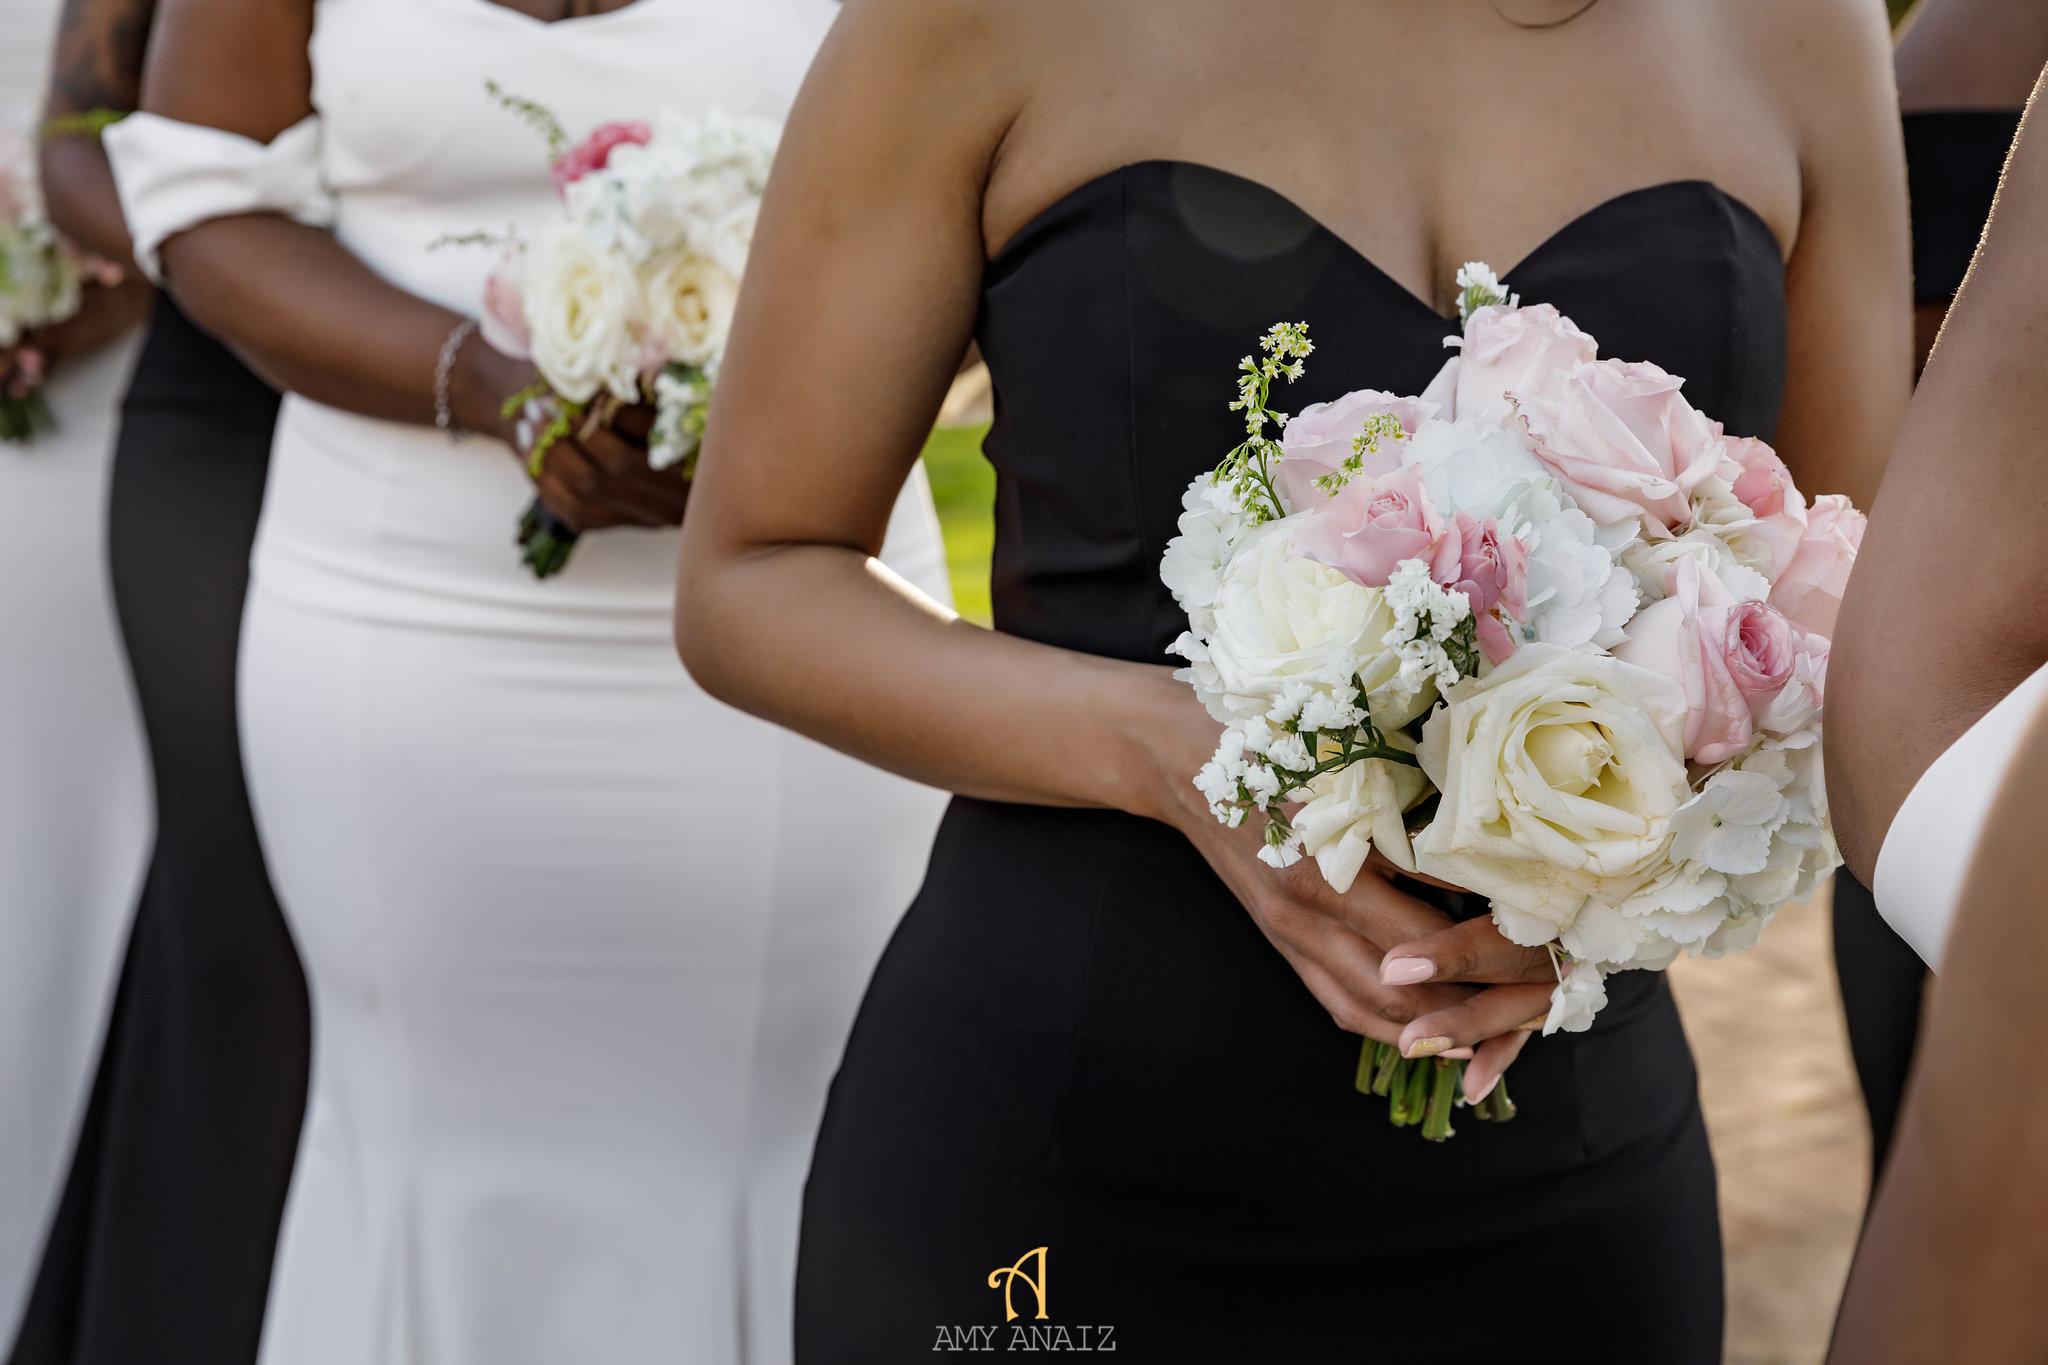 NYIT de Serversky Mansion, Bridesmaids Bouquet, White Runway Dress.JPG